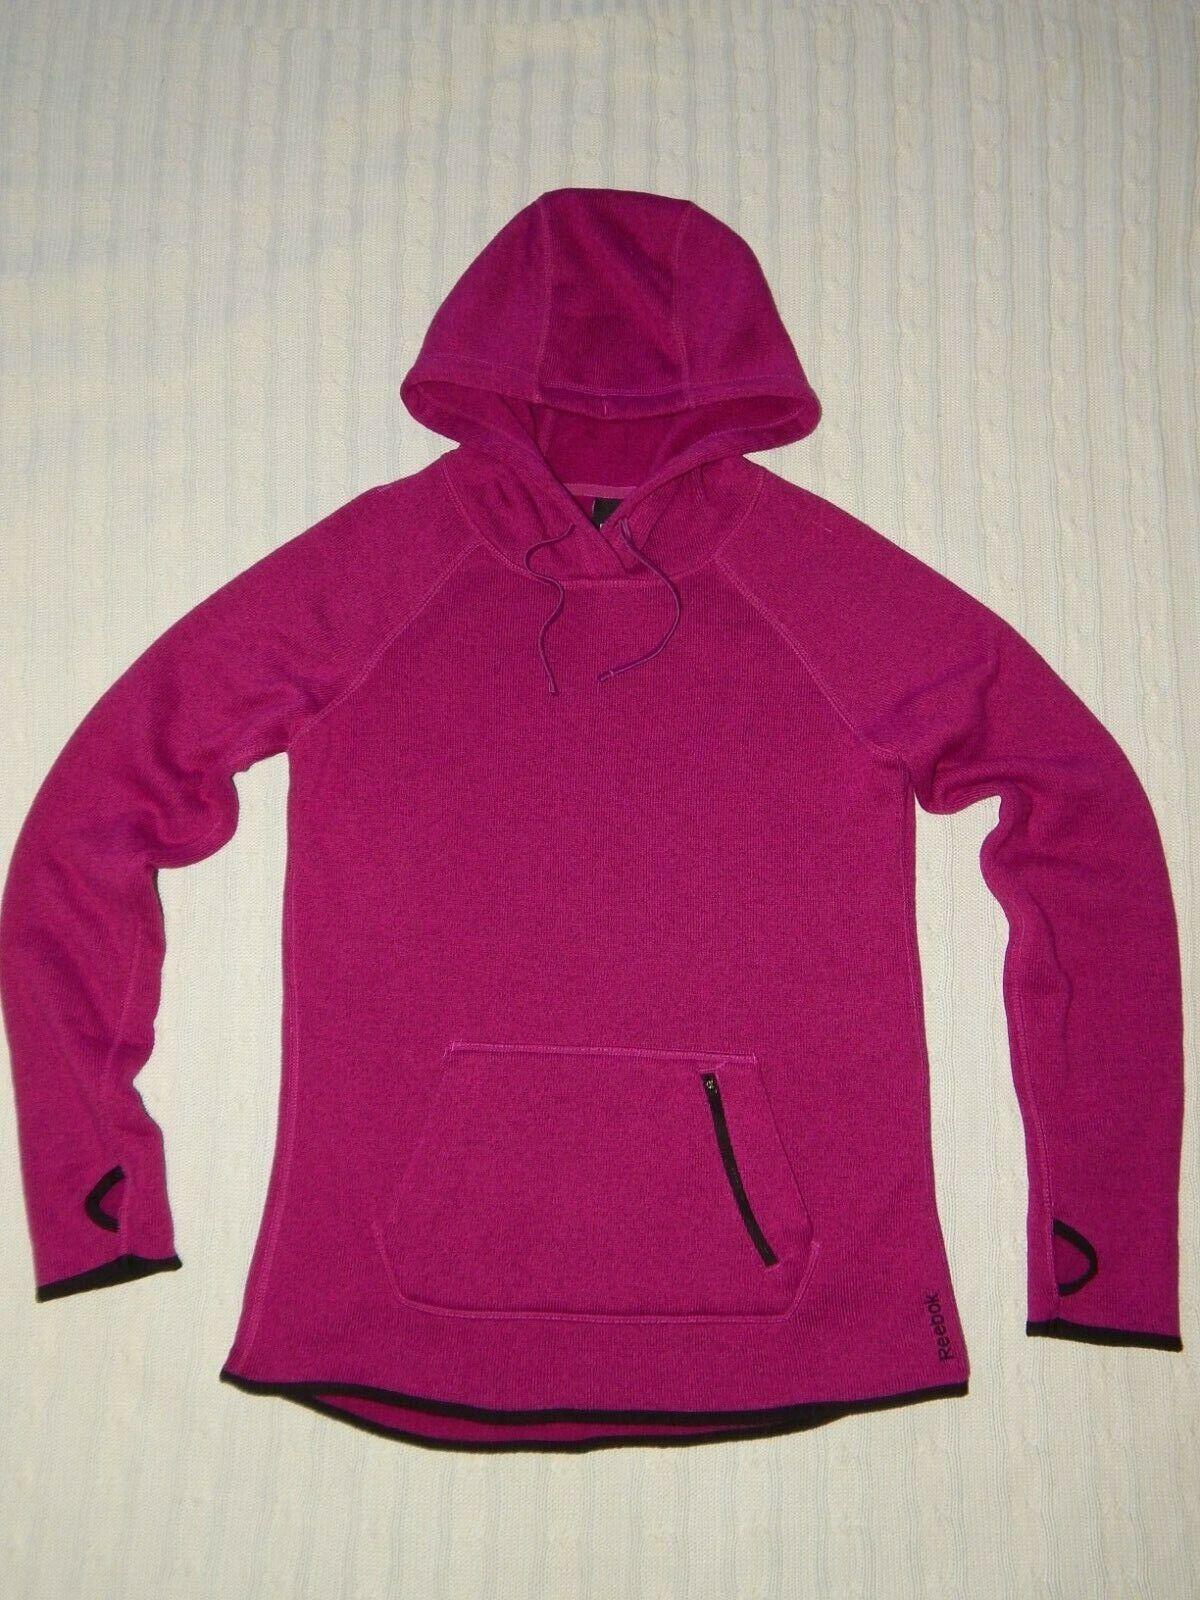 REEBOK ― Womens S ― Fushia Knit Fleece Lined Athletic Hoodie Sweatshirt ― #603A